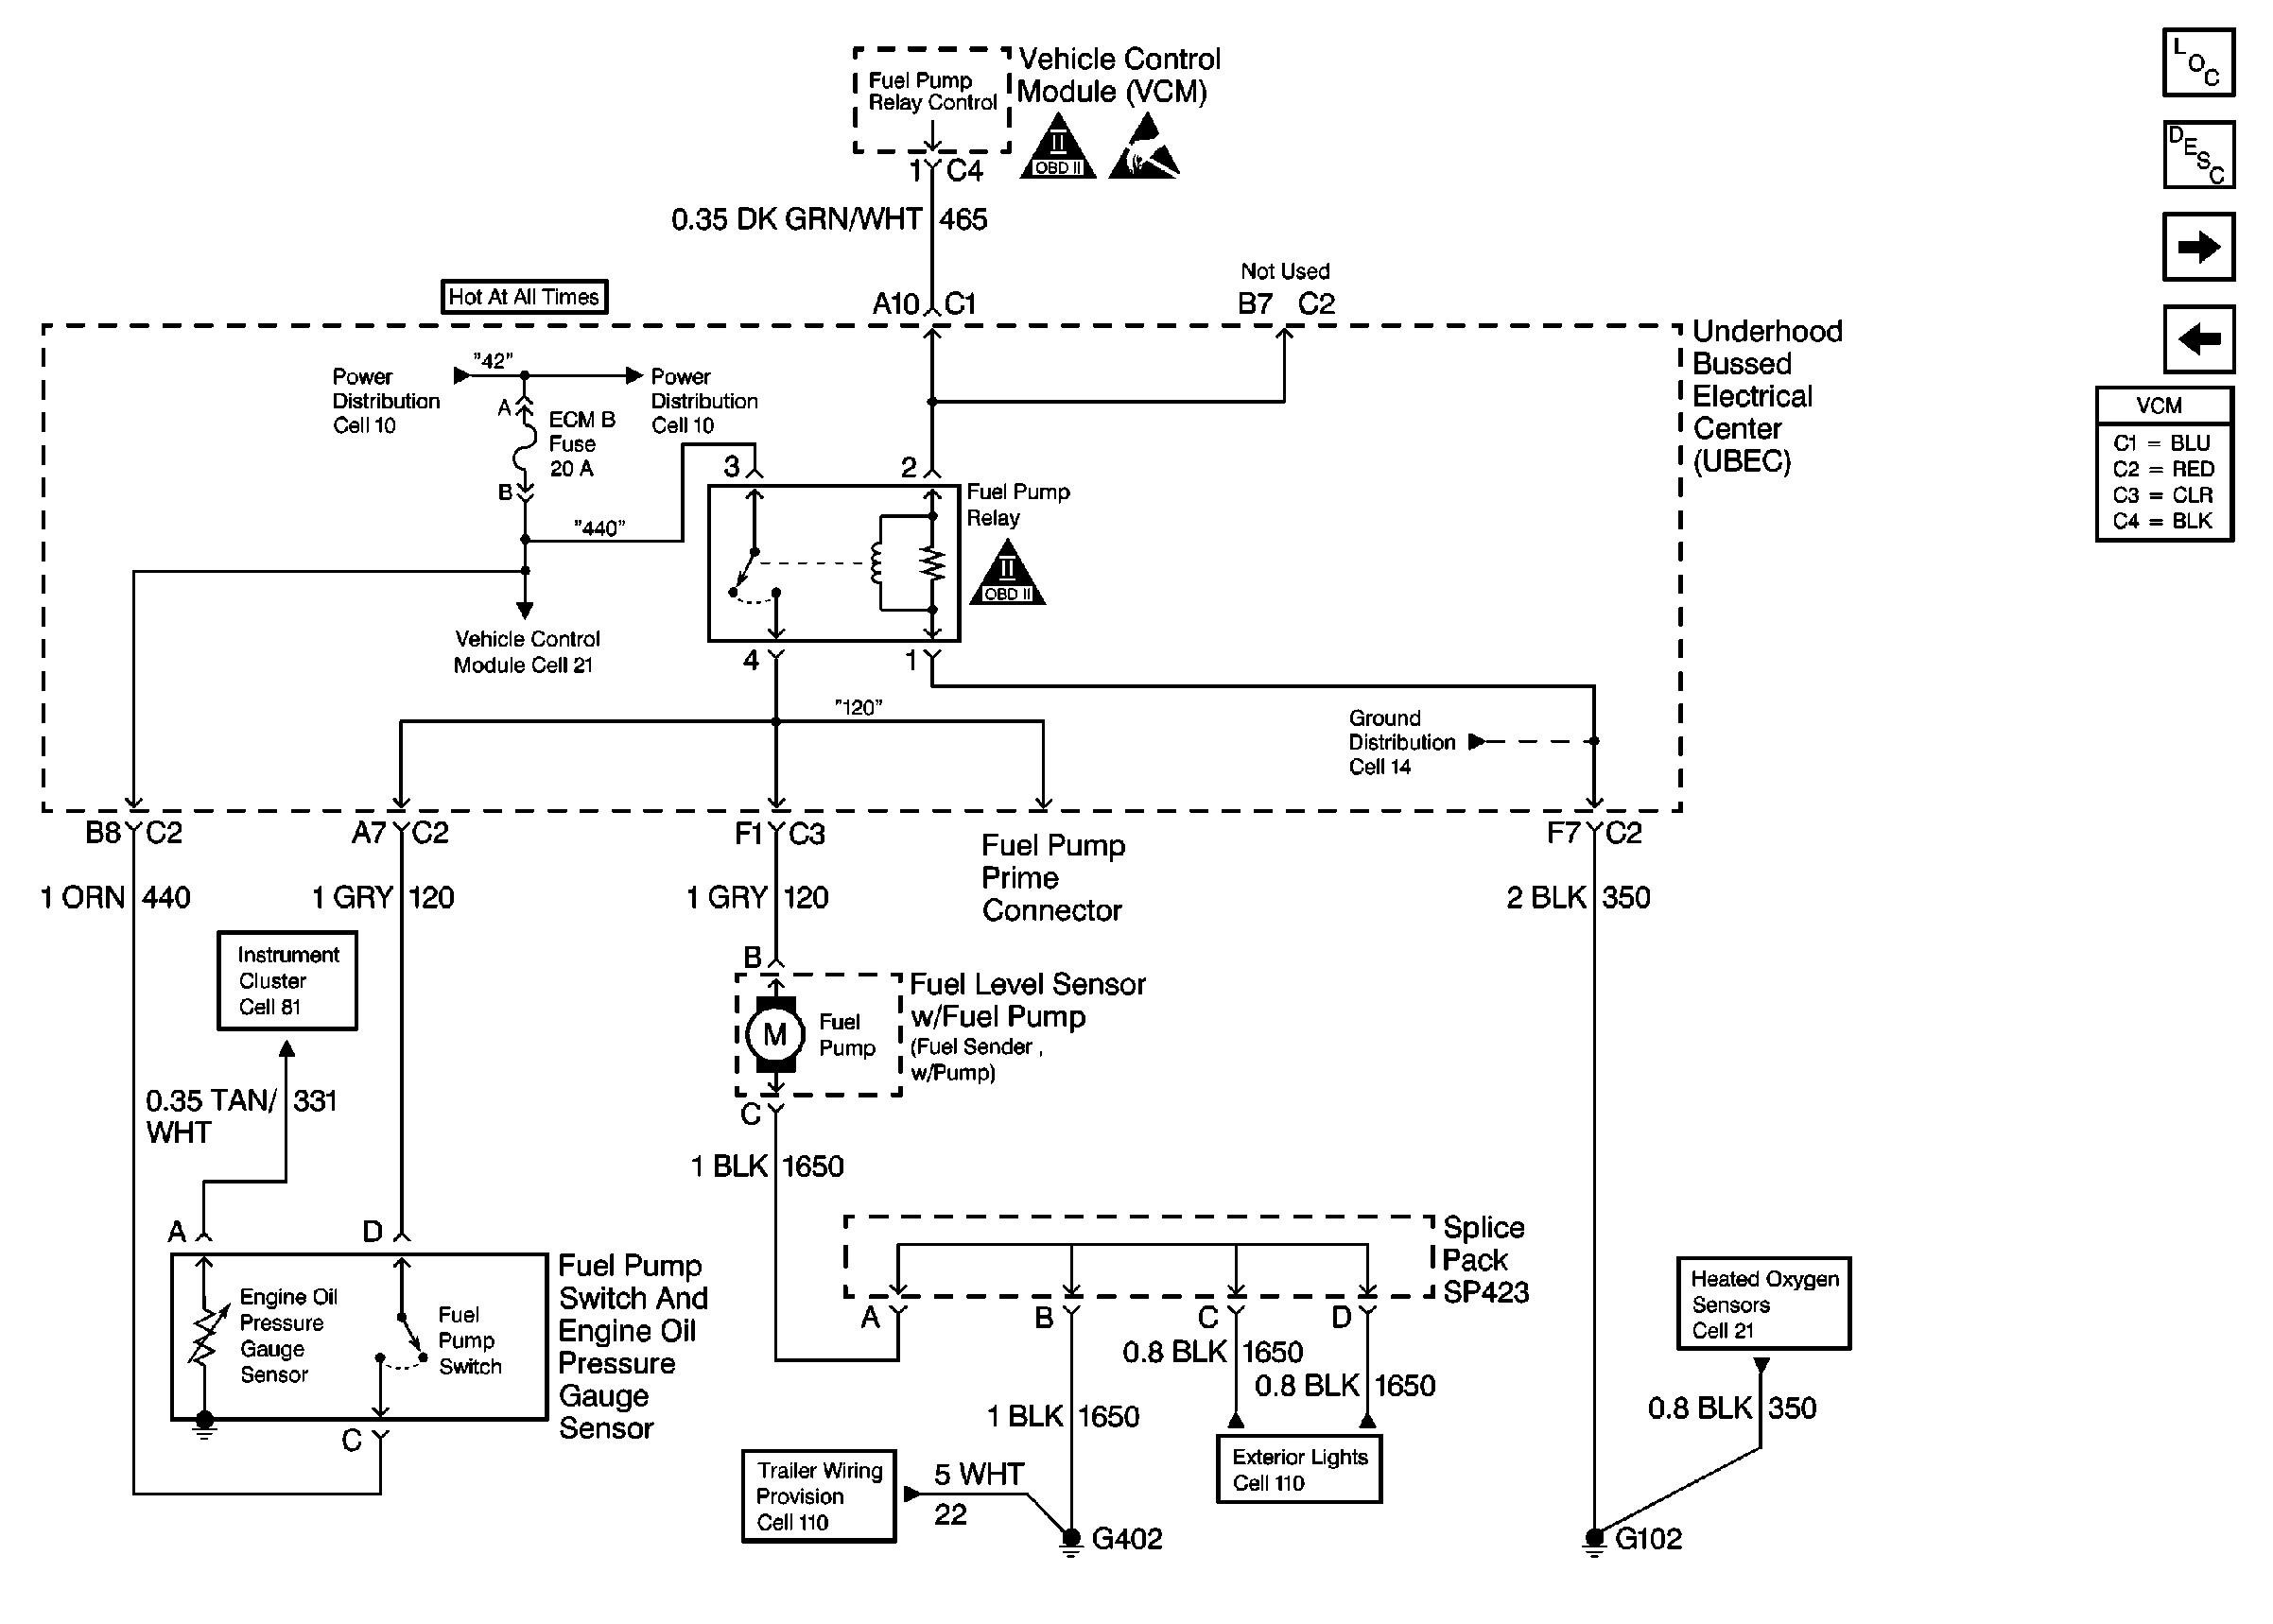 gm fuel pump wiring diagram chevrolet fuel pump wiring diagram rh kolnetanya